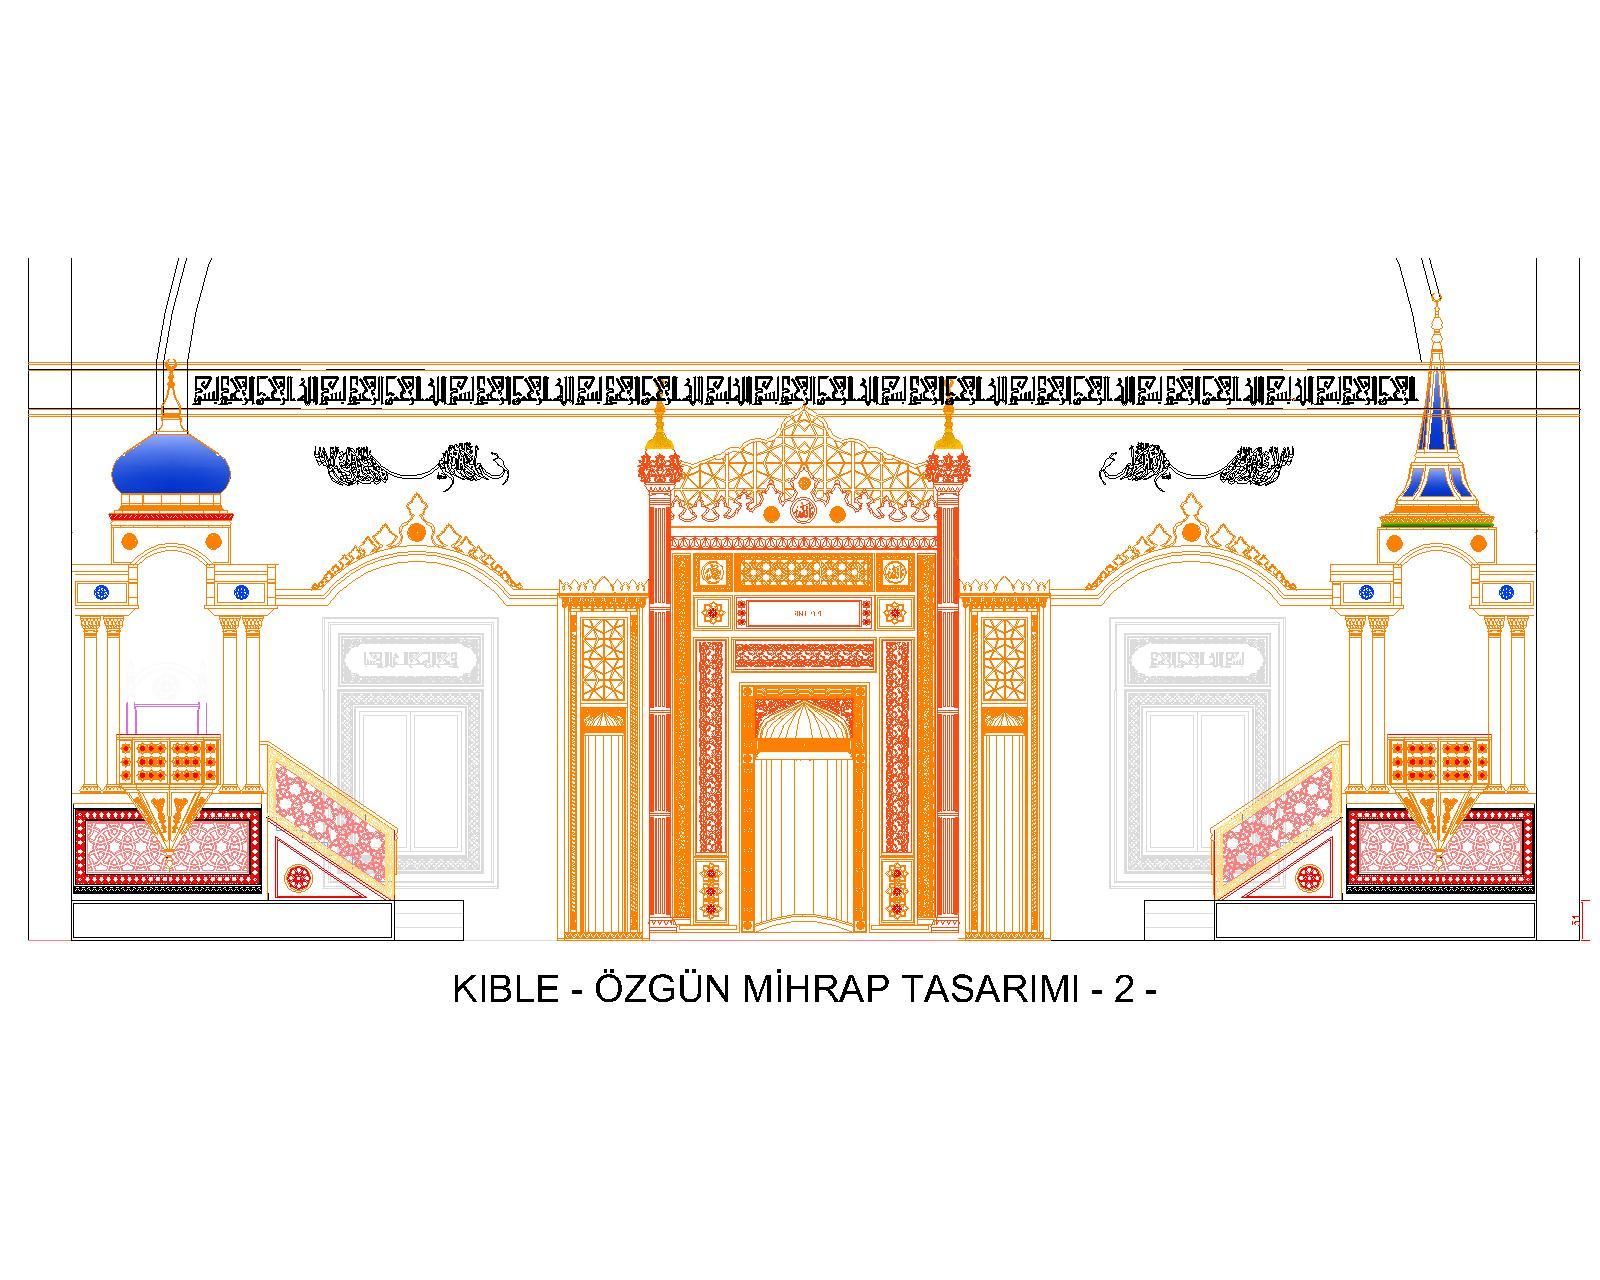 YB.ÖZGÜN KIBLE TASARIMI - 2-